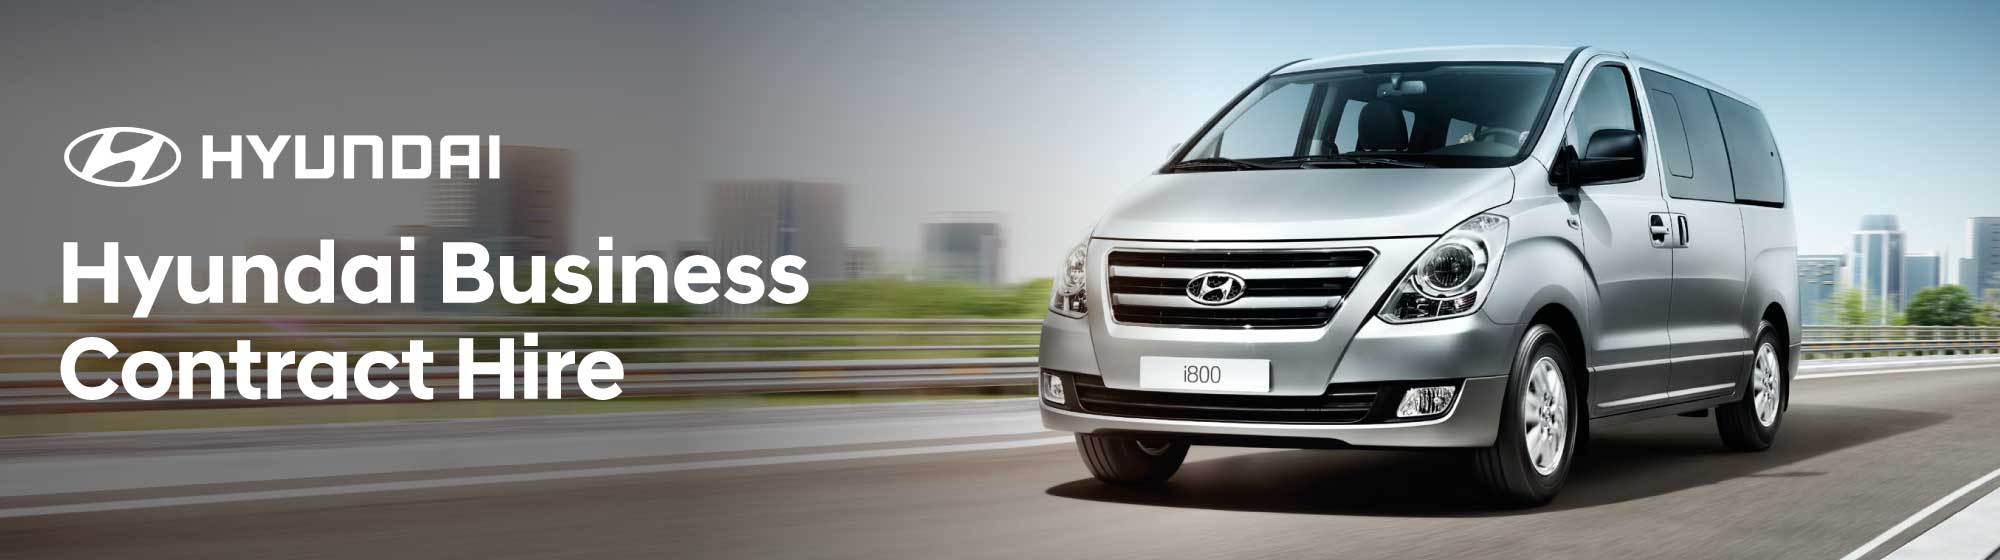 Hyundai Personal Contract Hire